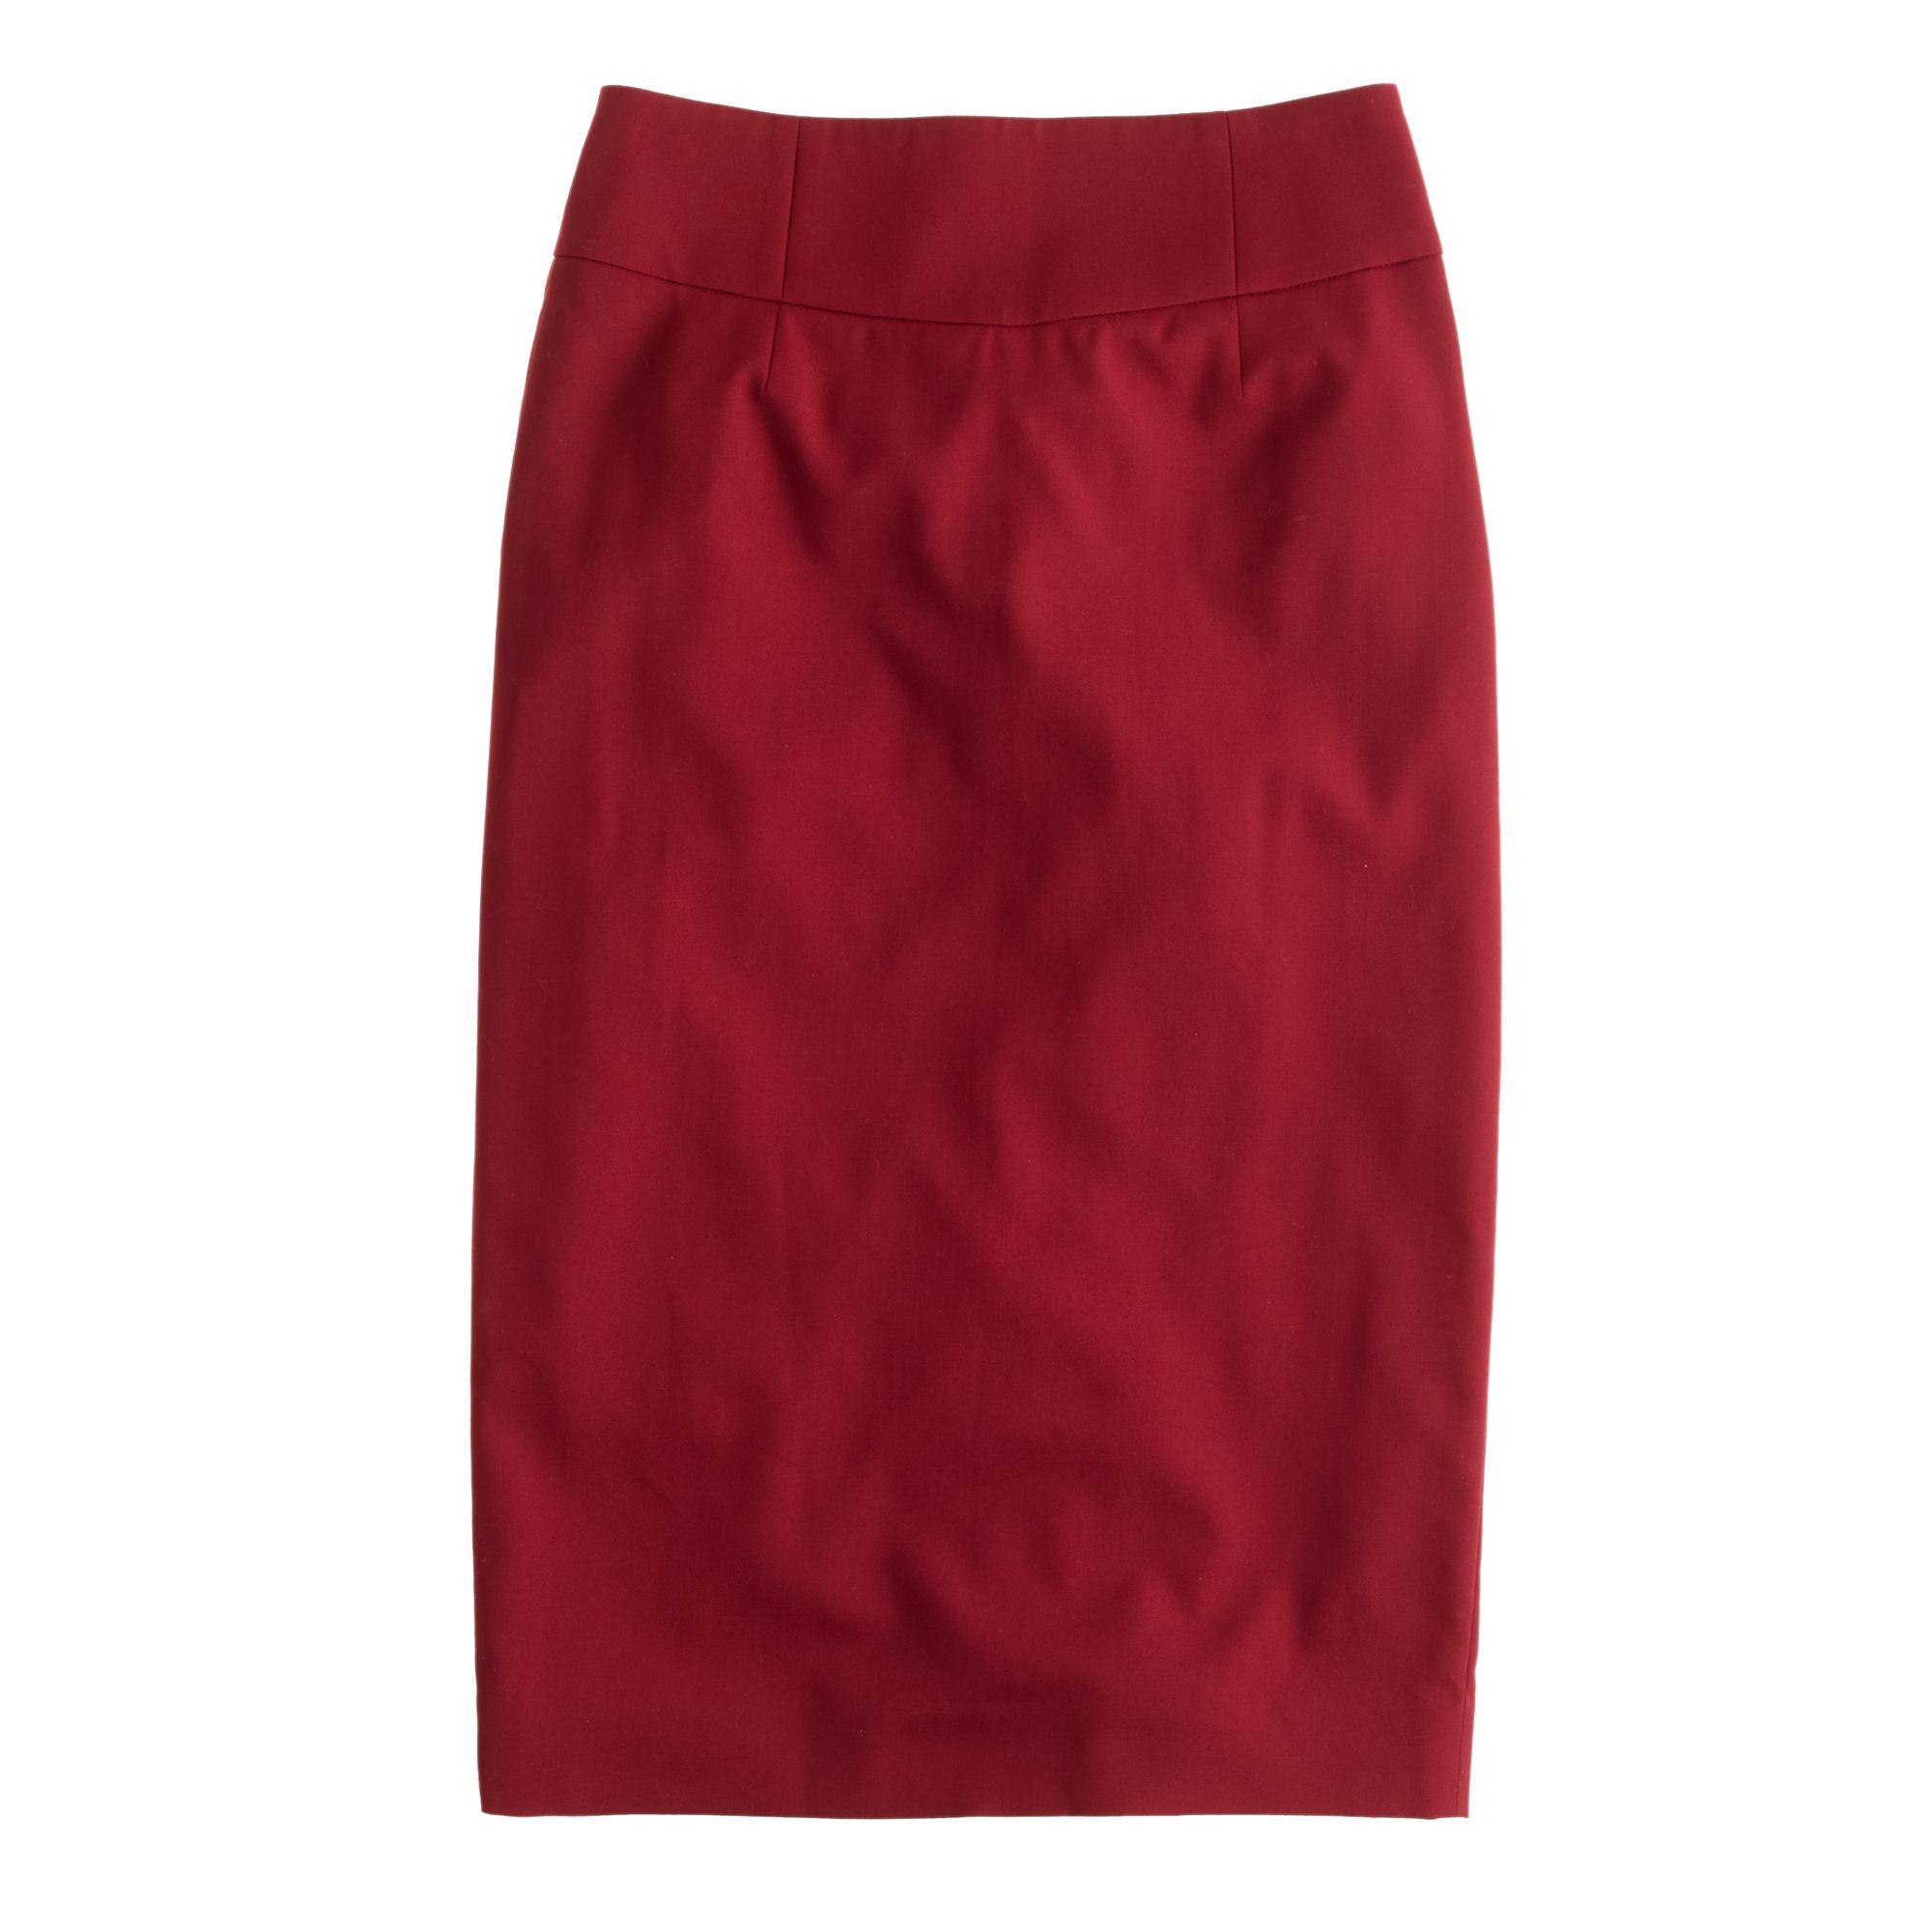 j crew telegraph pencil skirt in 120s wool in